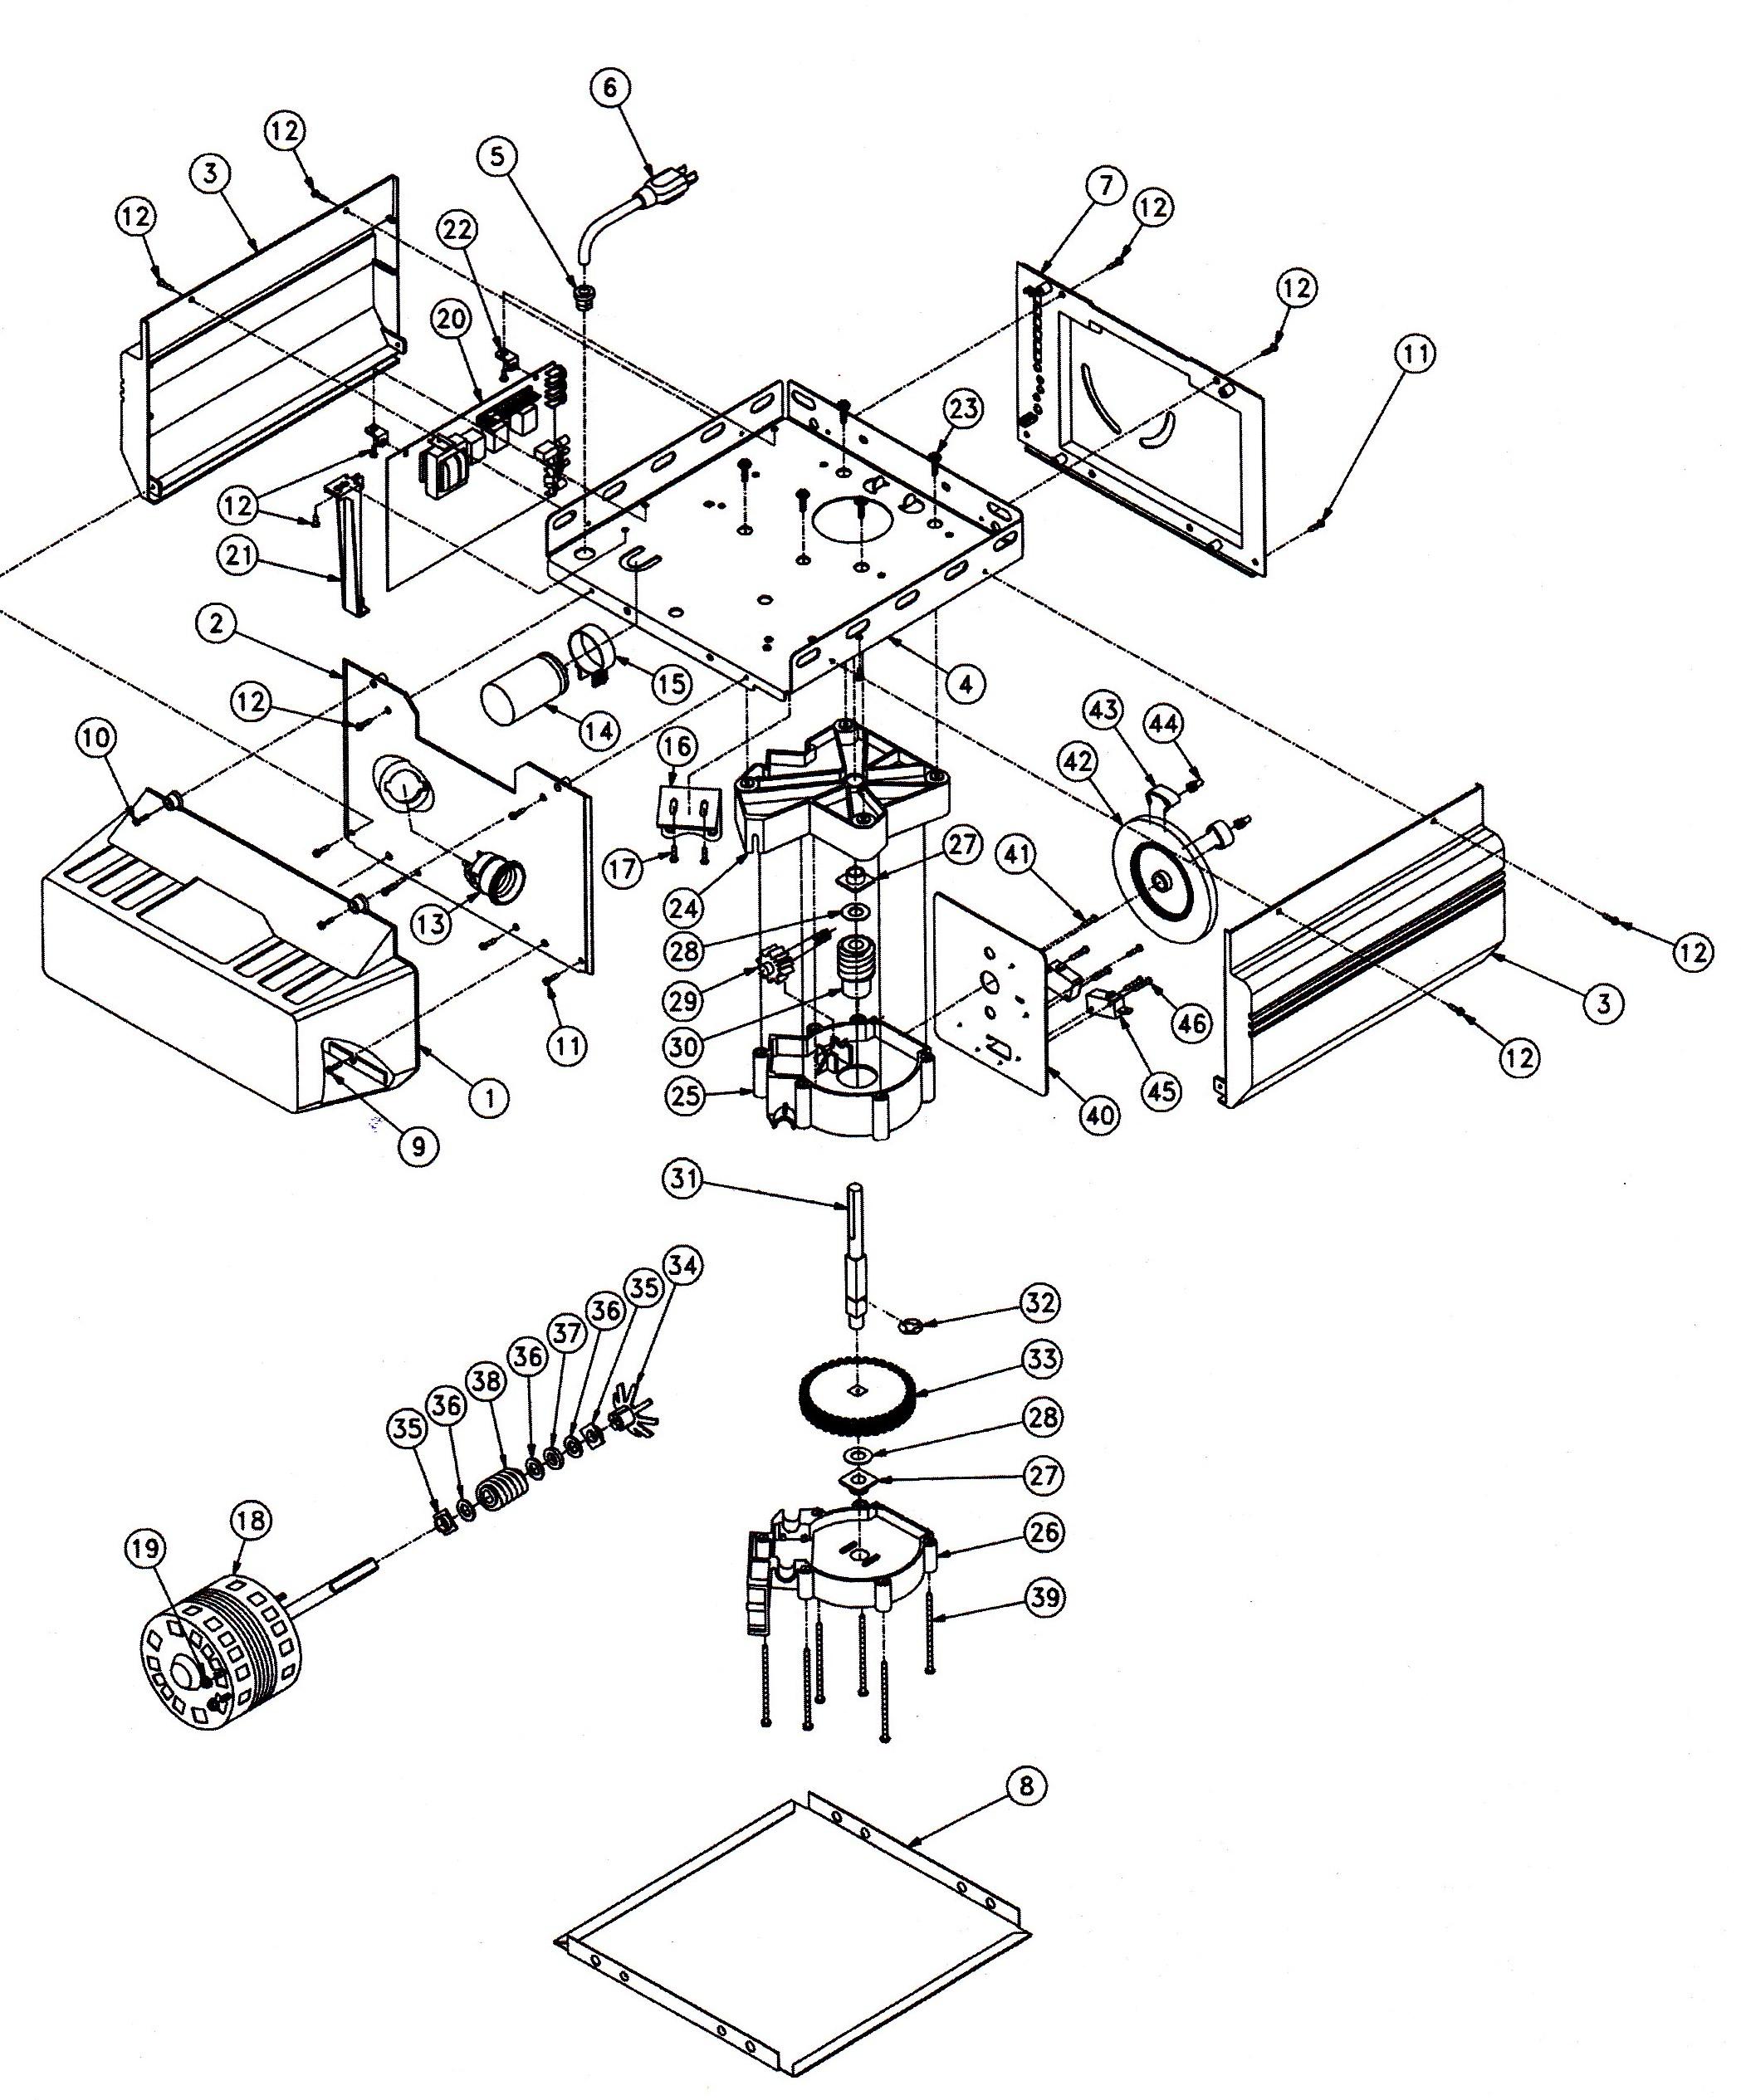 Pbs 3 Garage Door Wiring Diagram Block Explanation Overhead 28 Images Diagrams Panicattacktreatment Co Wire Circuit